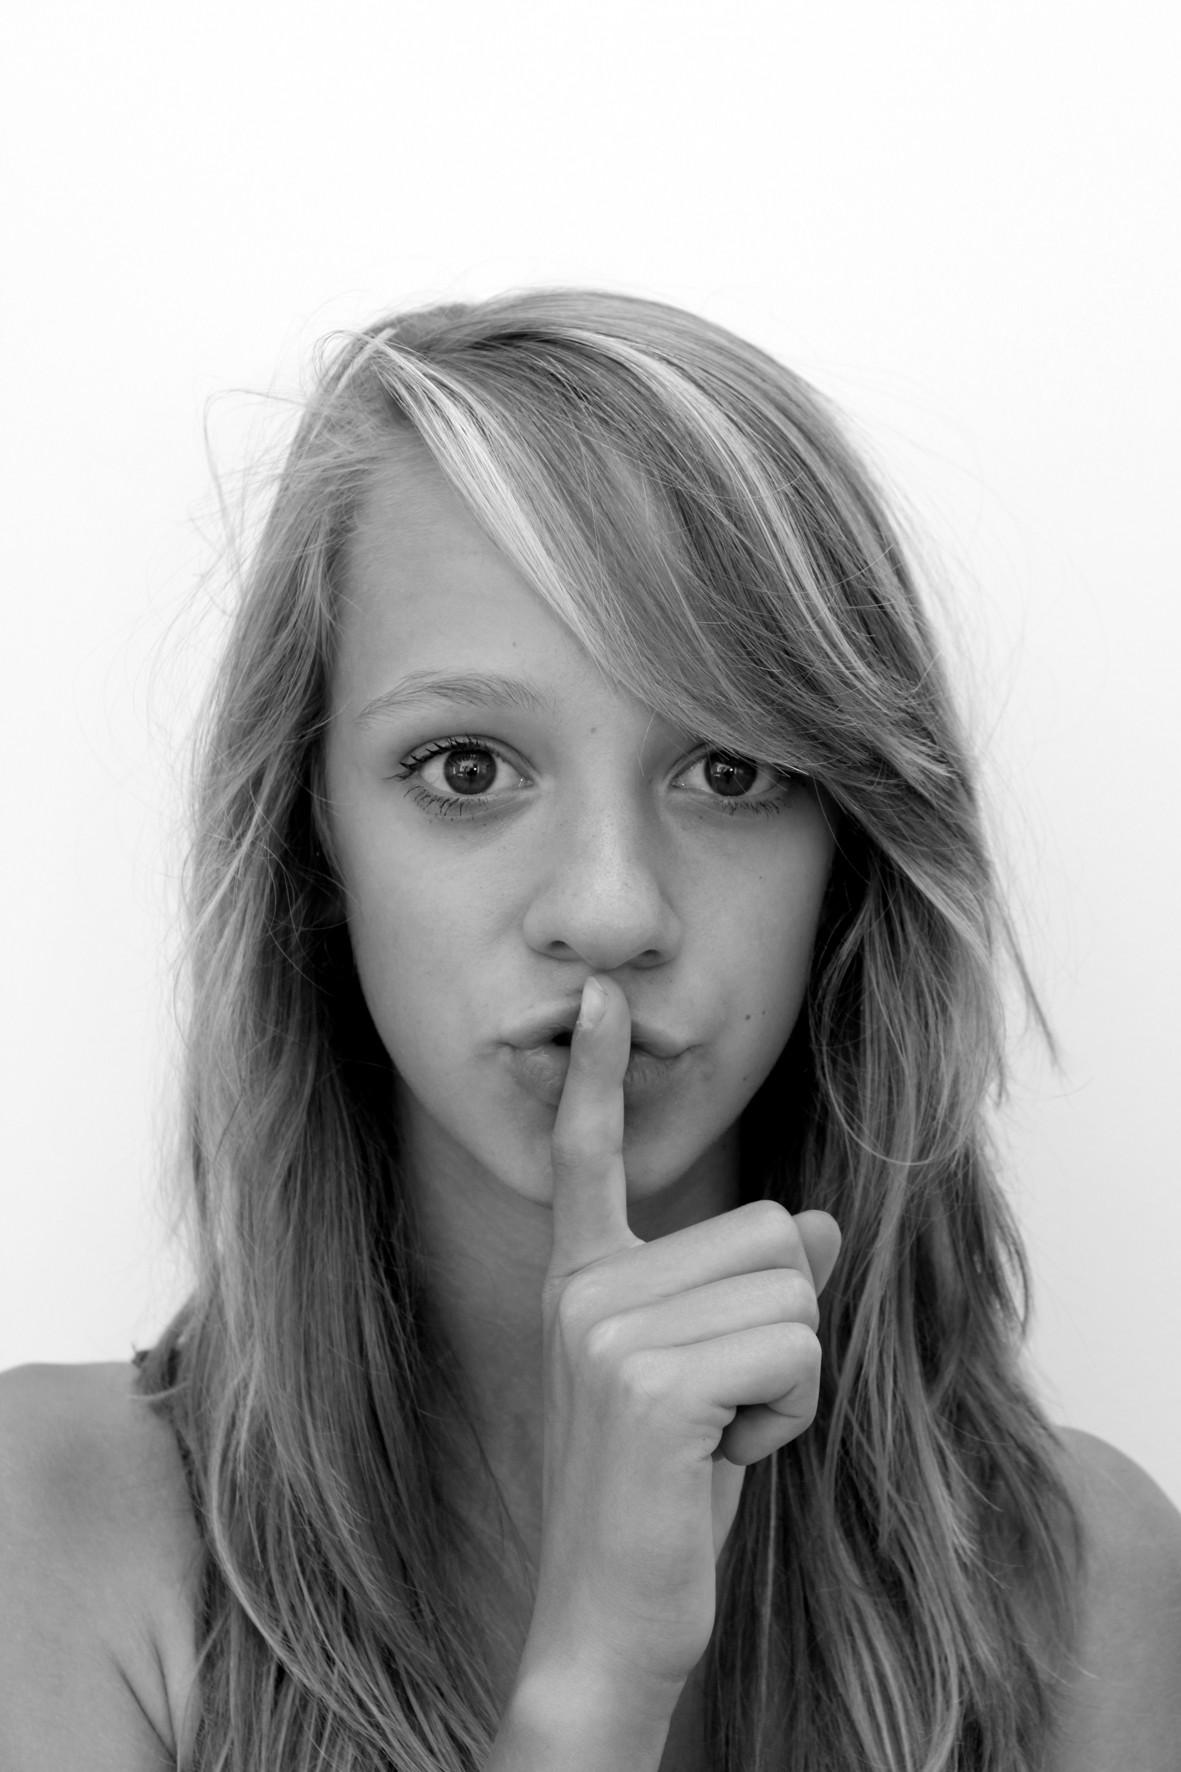 Ssst ...-protestfoto